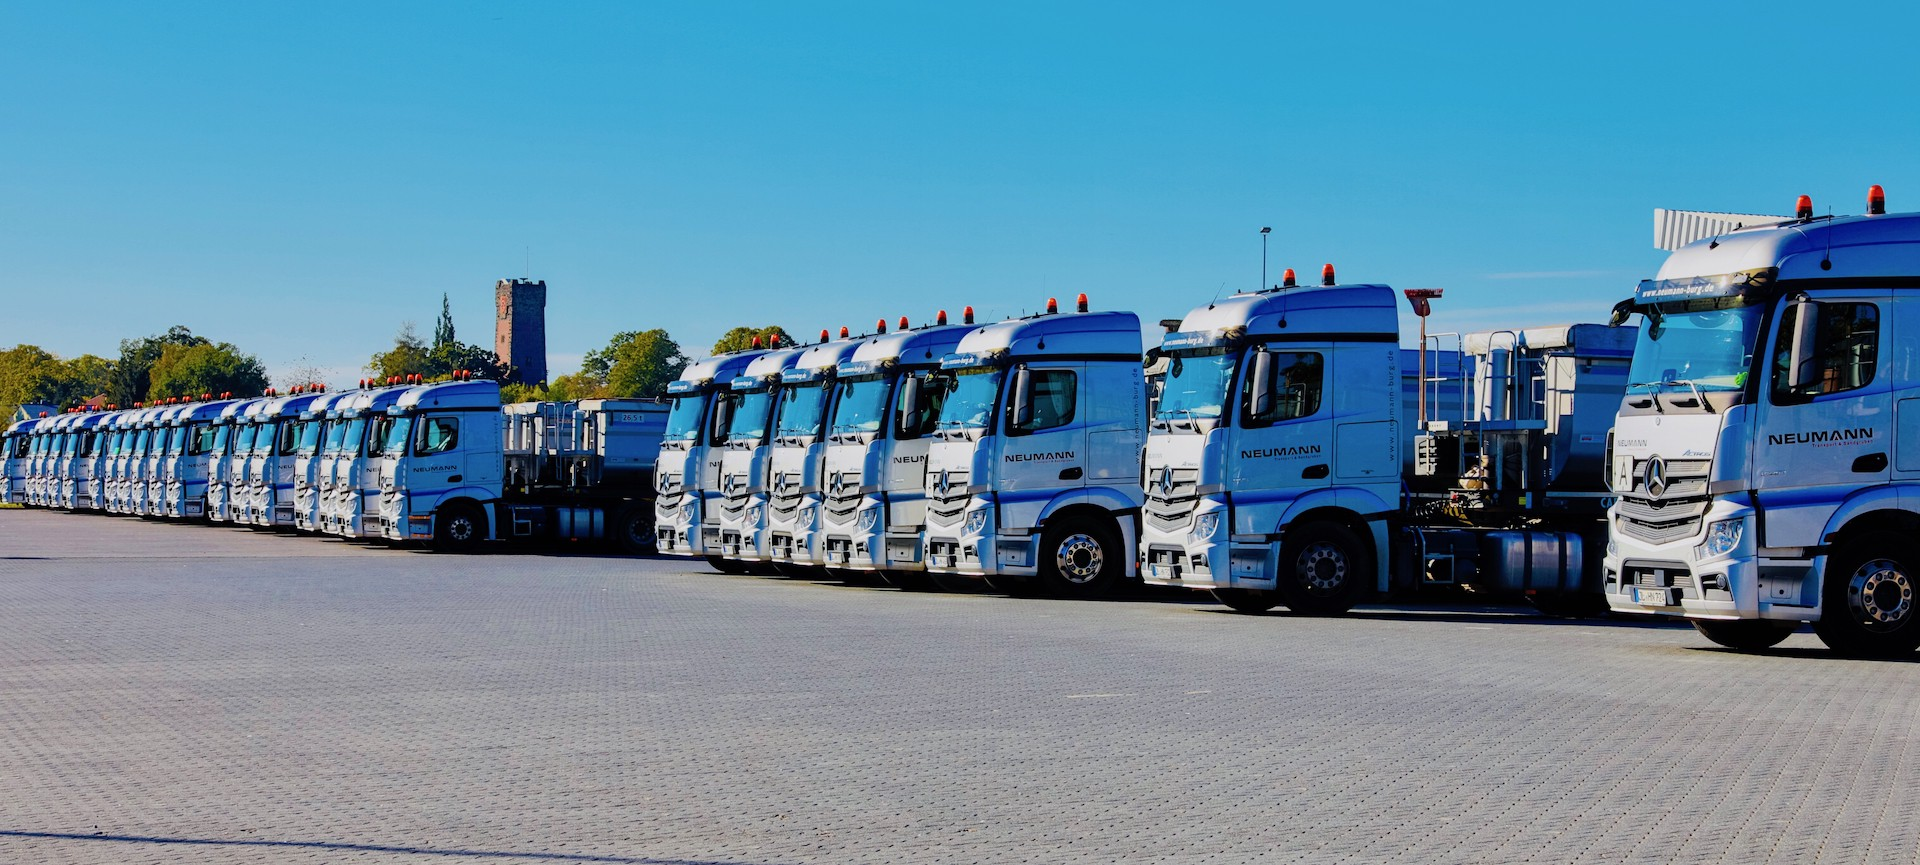 Abbildung NTS Flotte